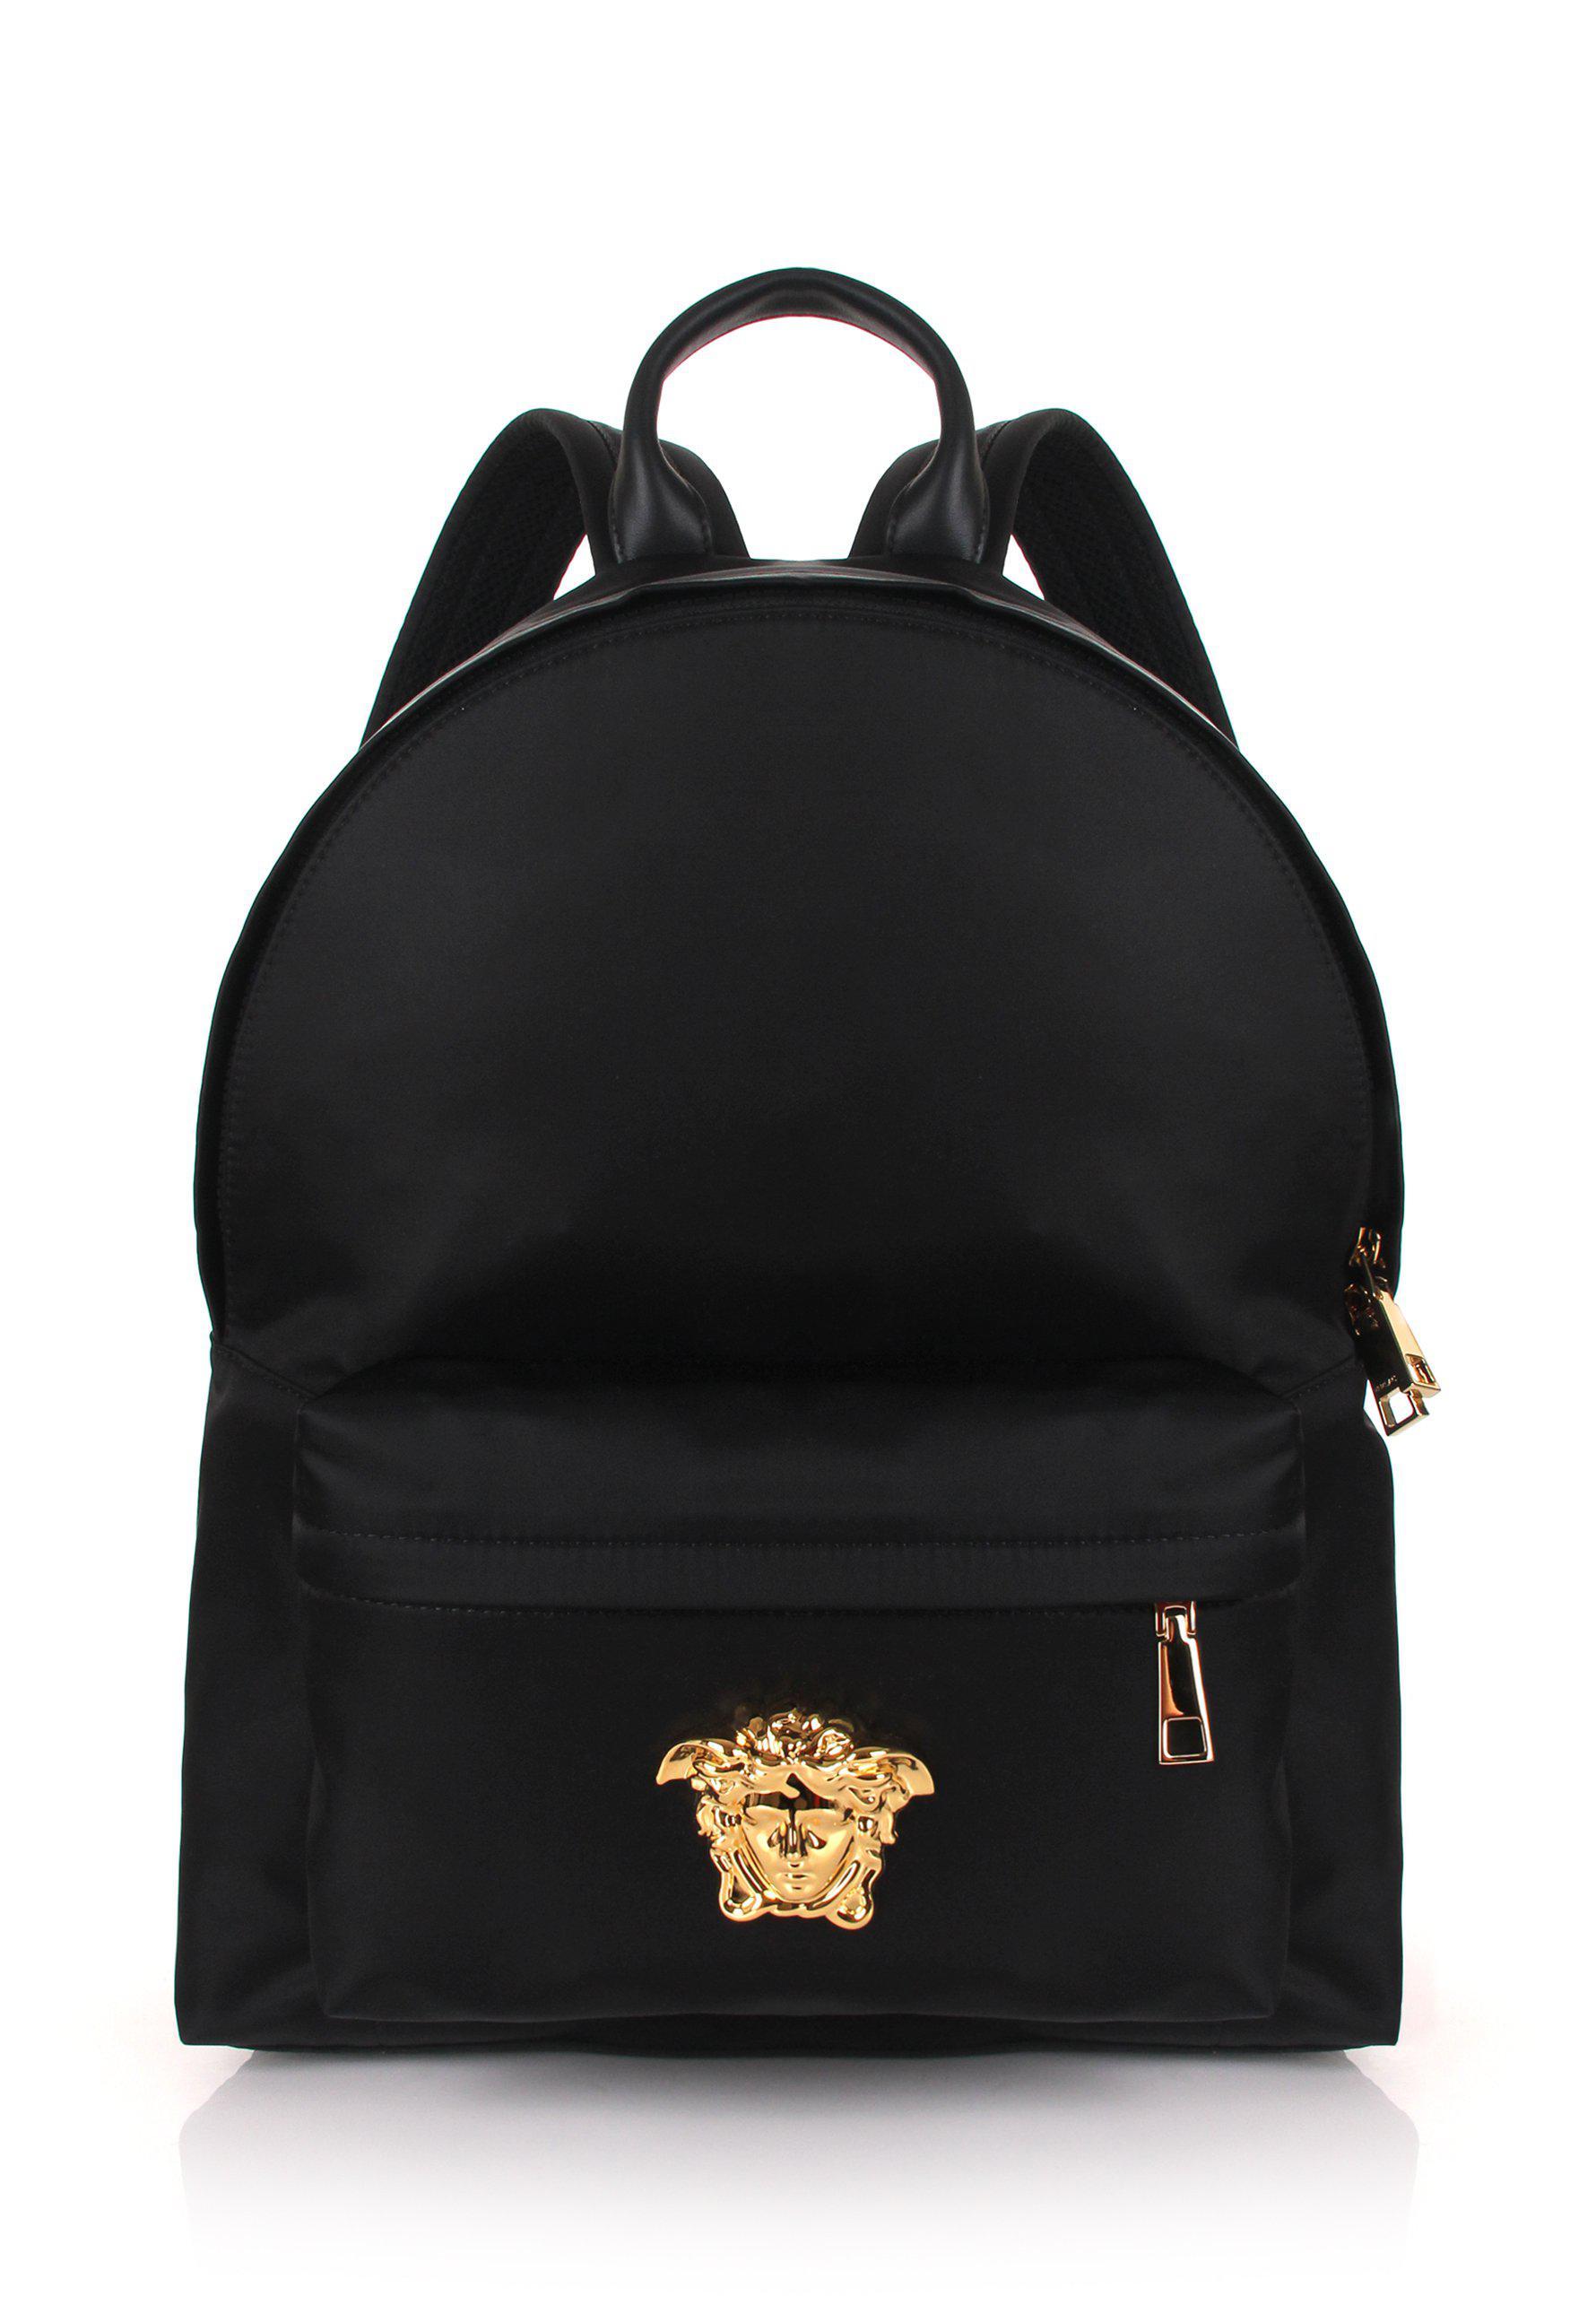 991ced7bc768 Mens Medusa Nylon Backpack Blackgold buy online 1c568 0dbc5  Versace ...